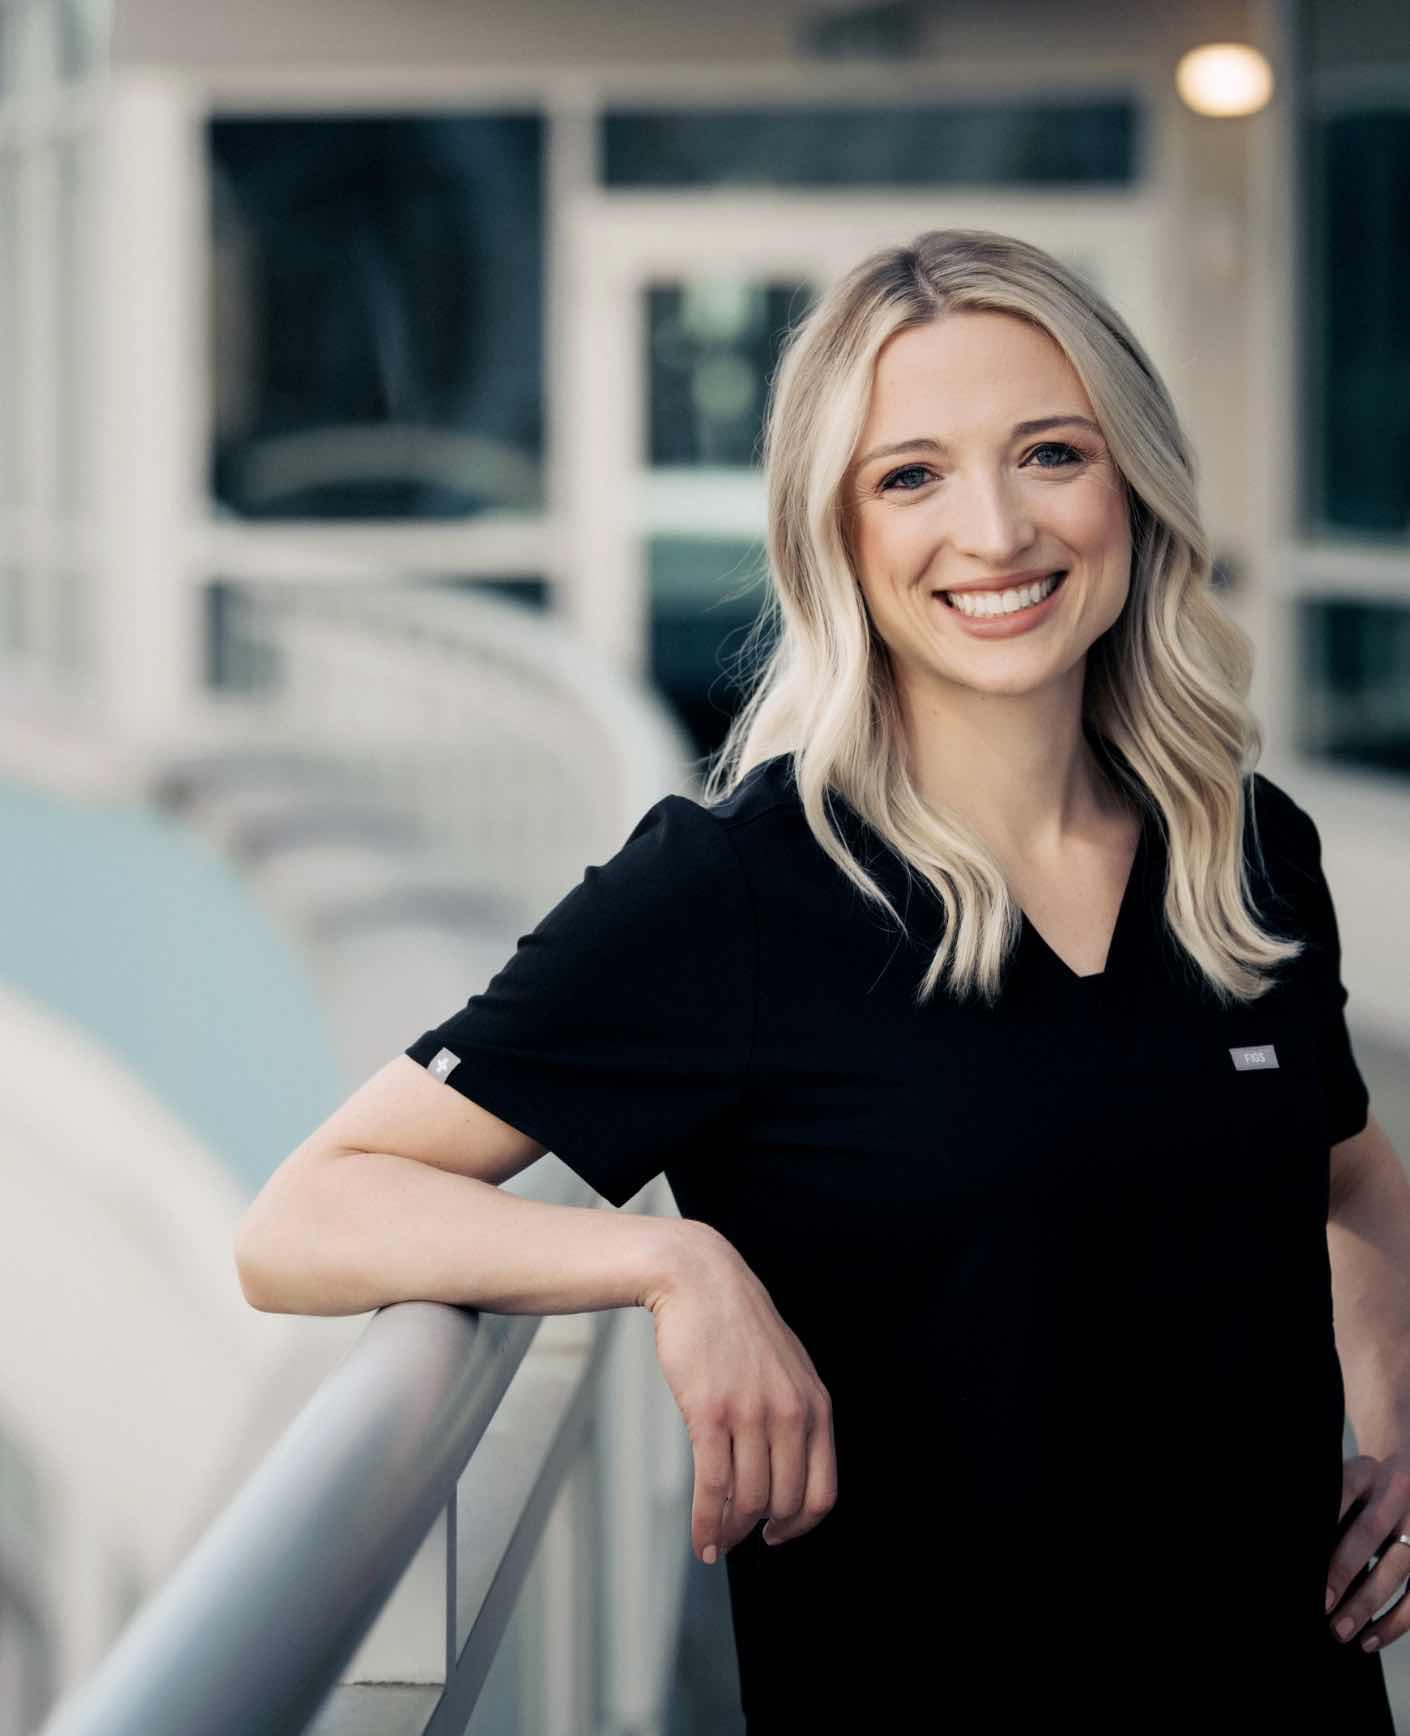 Photo of Dr. Jennifer D'Silva, a dentist in Charlotte, North Carolina